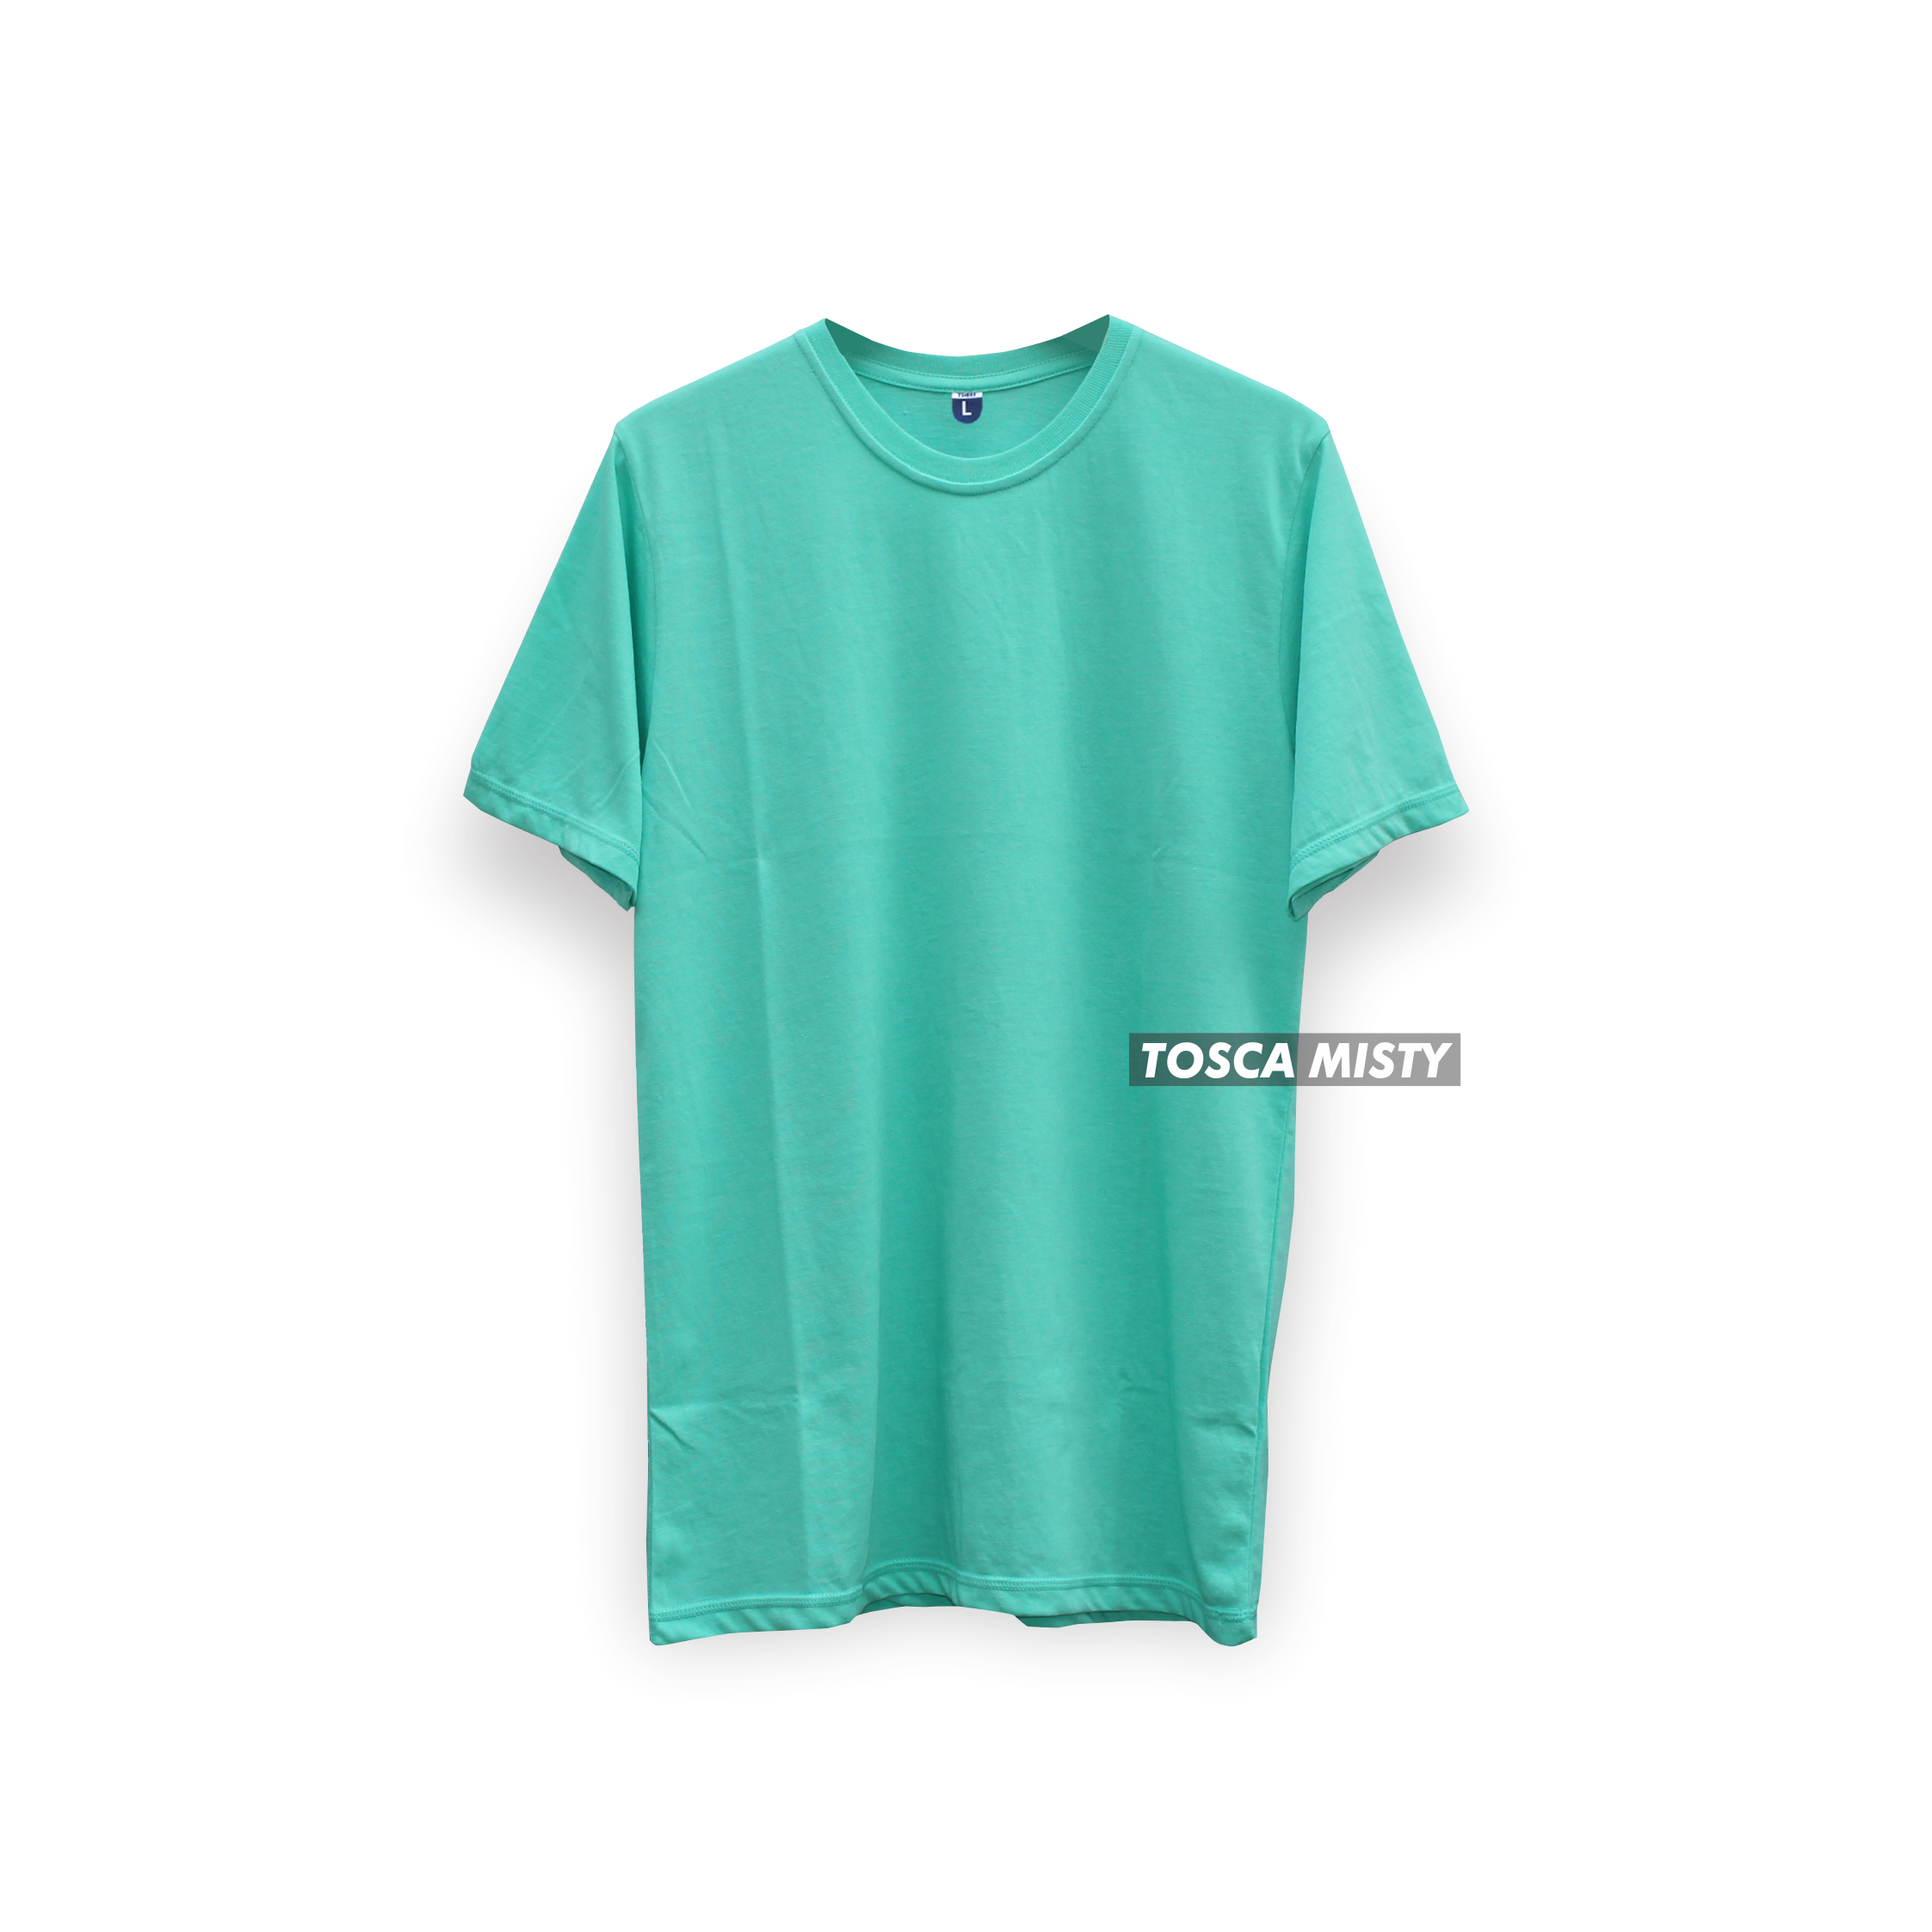 Cottonbdg Shop Line Kaos Polos Green Misty Lengan Pendek Tosca